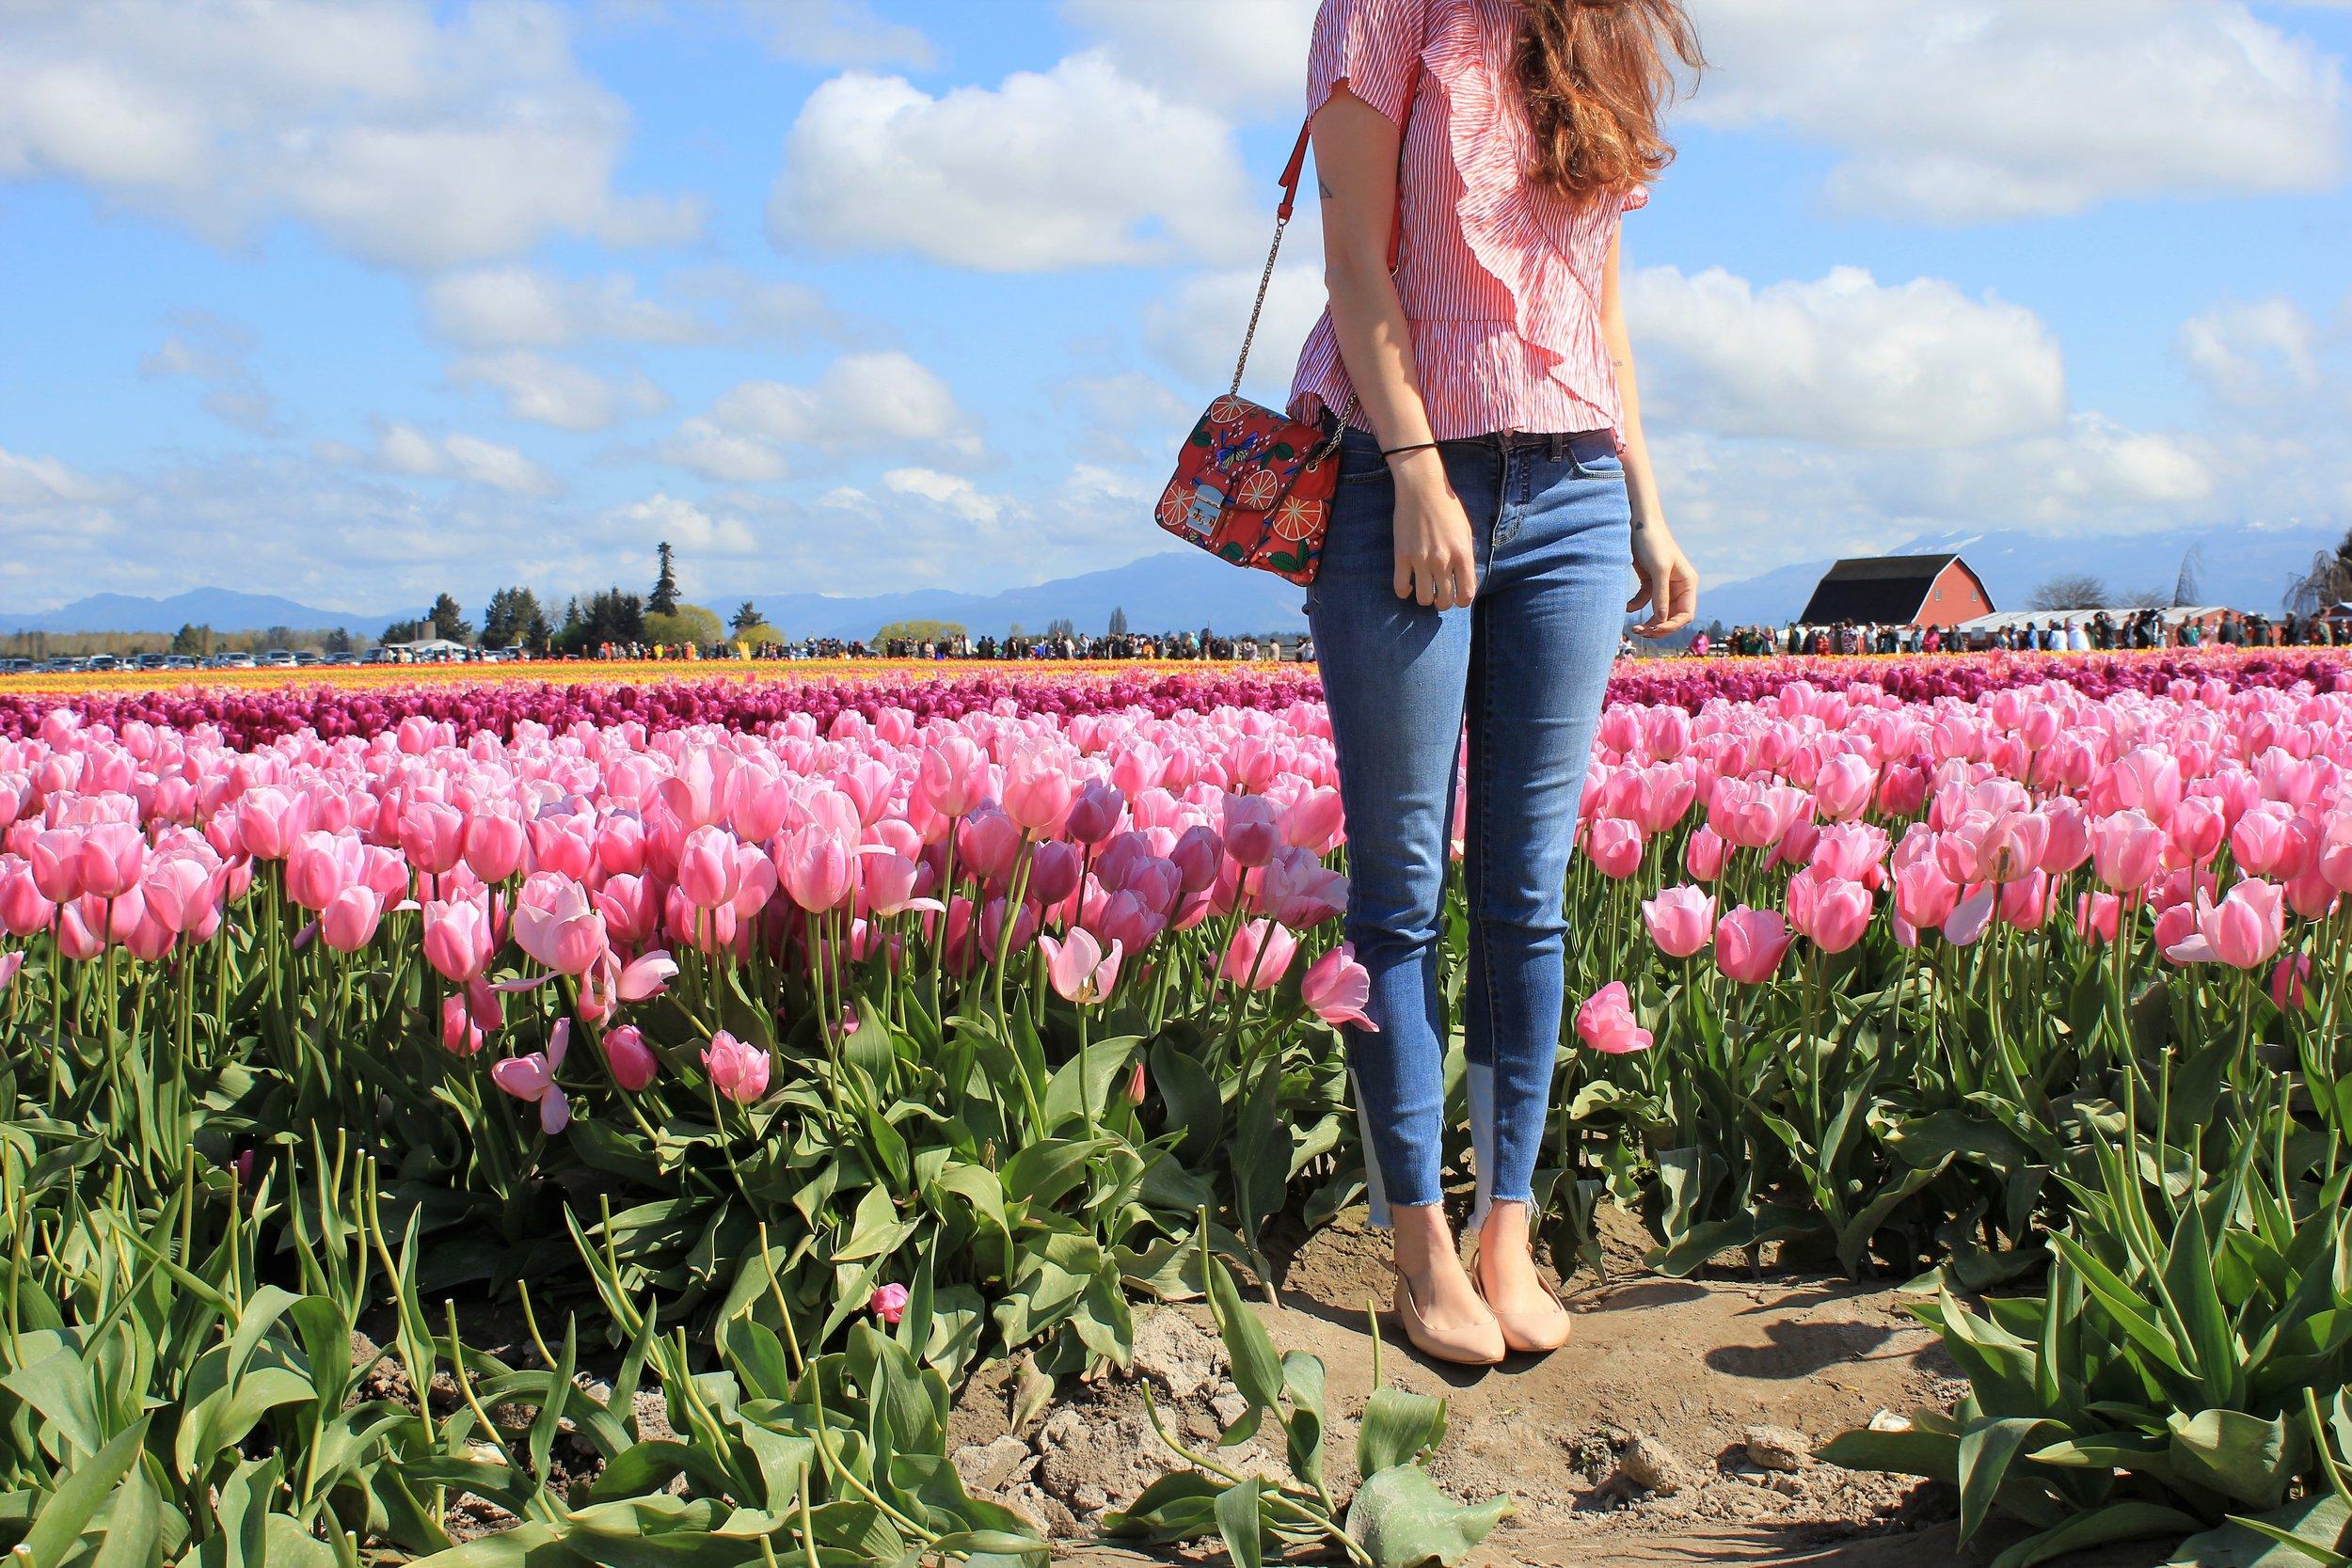 Skagit Valley Tulip Festival near Seattle, WA